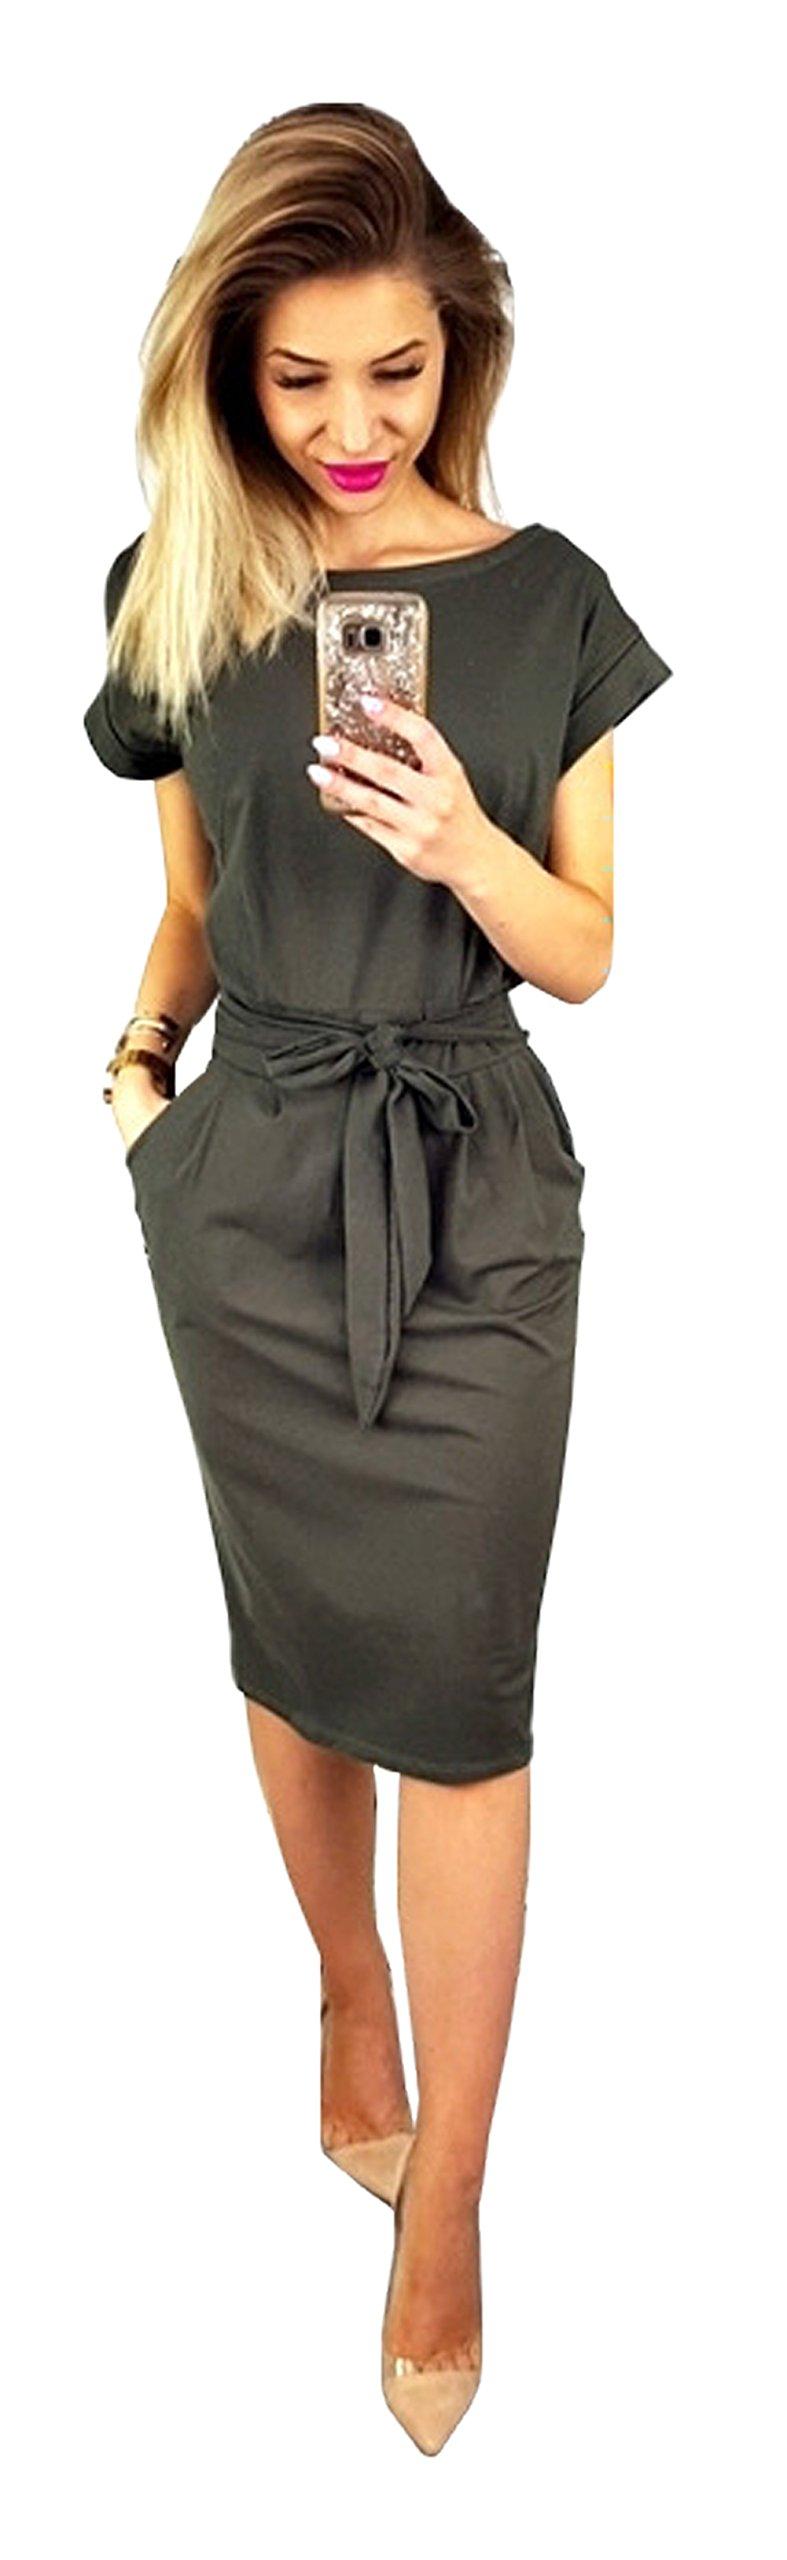 Longwu Women's Elegant Short Sleeve Wear to Work Casual Pencil Dress with Belt Dark Grey-3XL